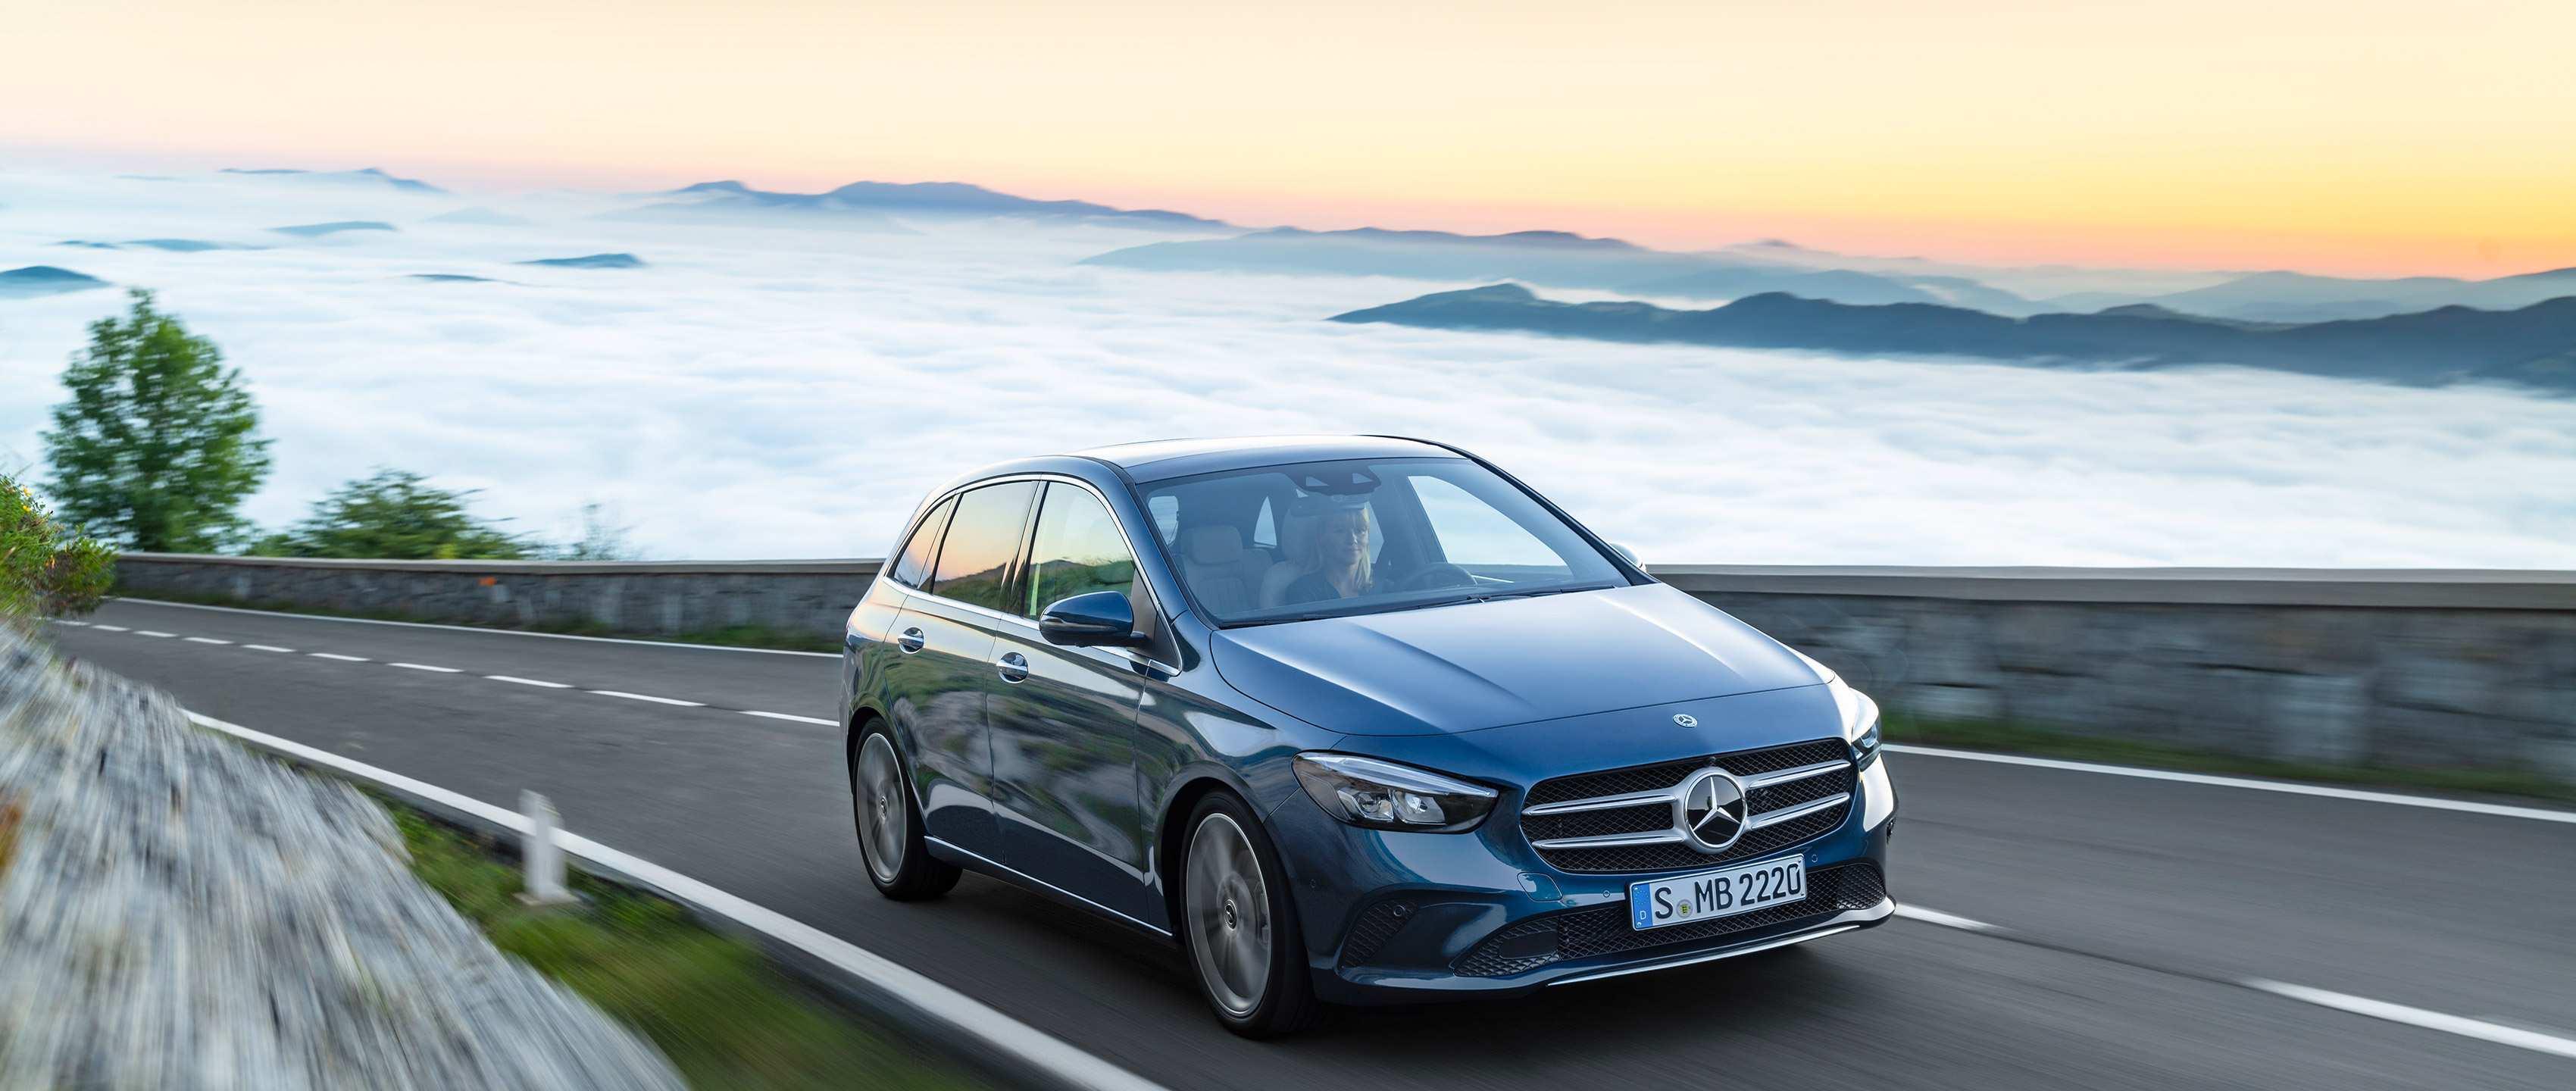 48 Concept of Mercedes B Klasse 2019 Price and Review for Mercedes B Klasse 2019